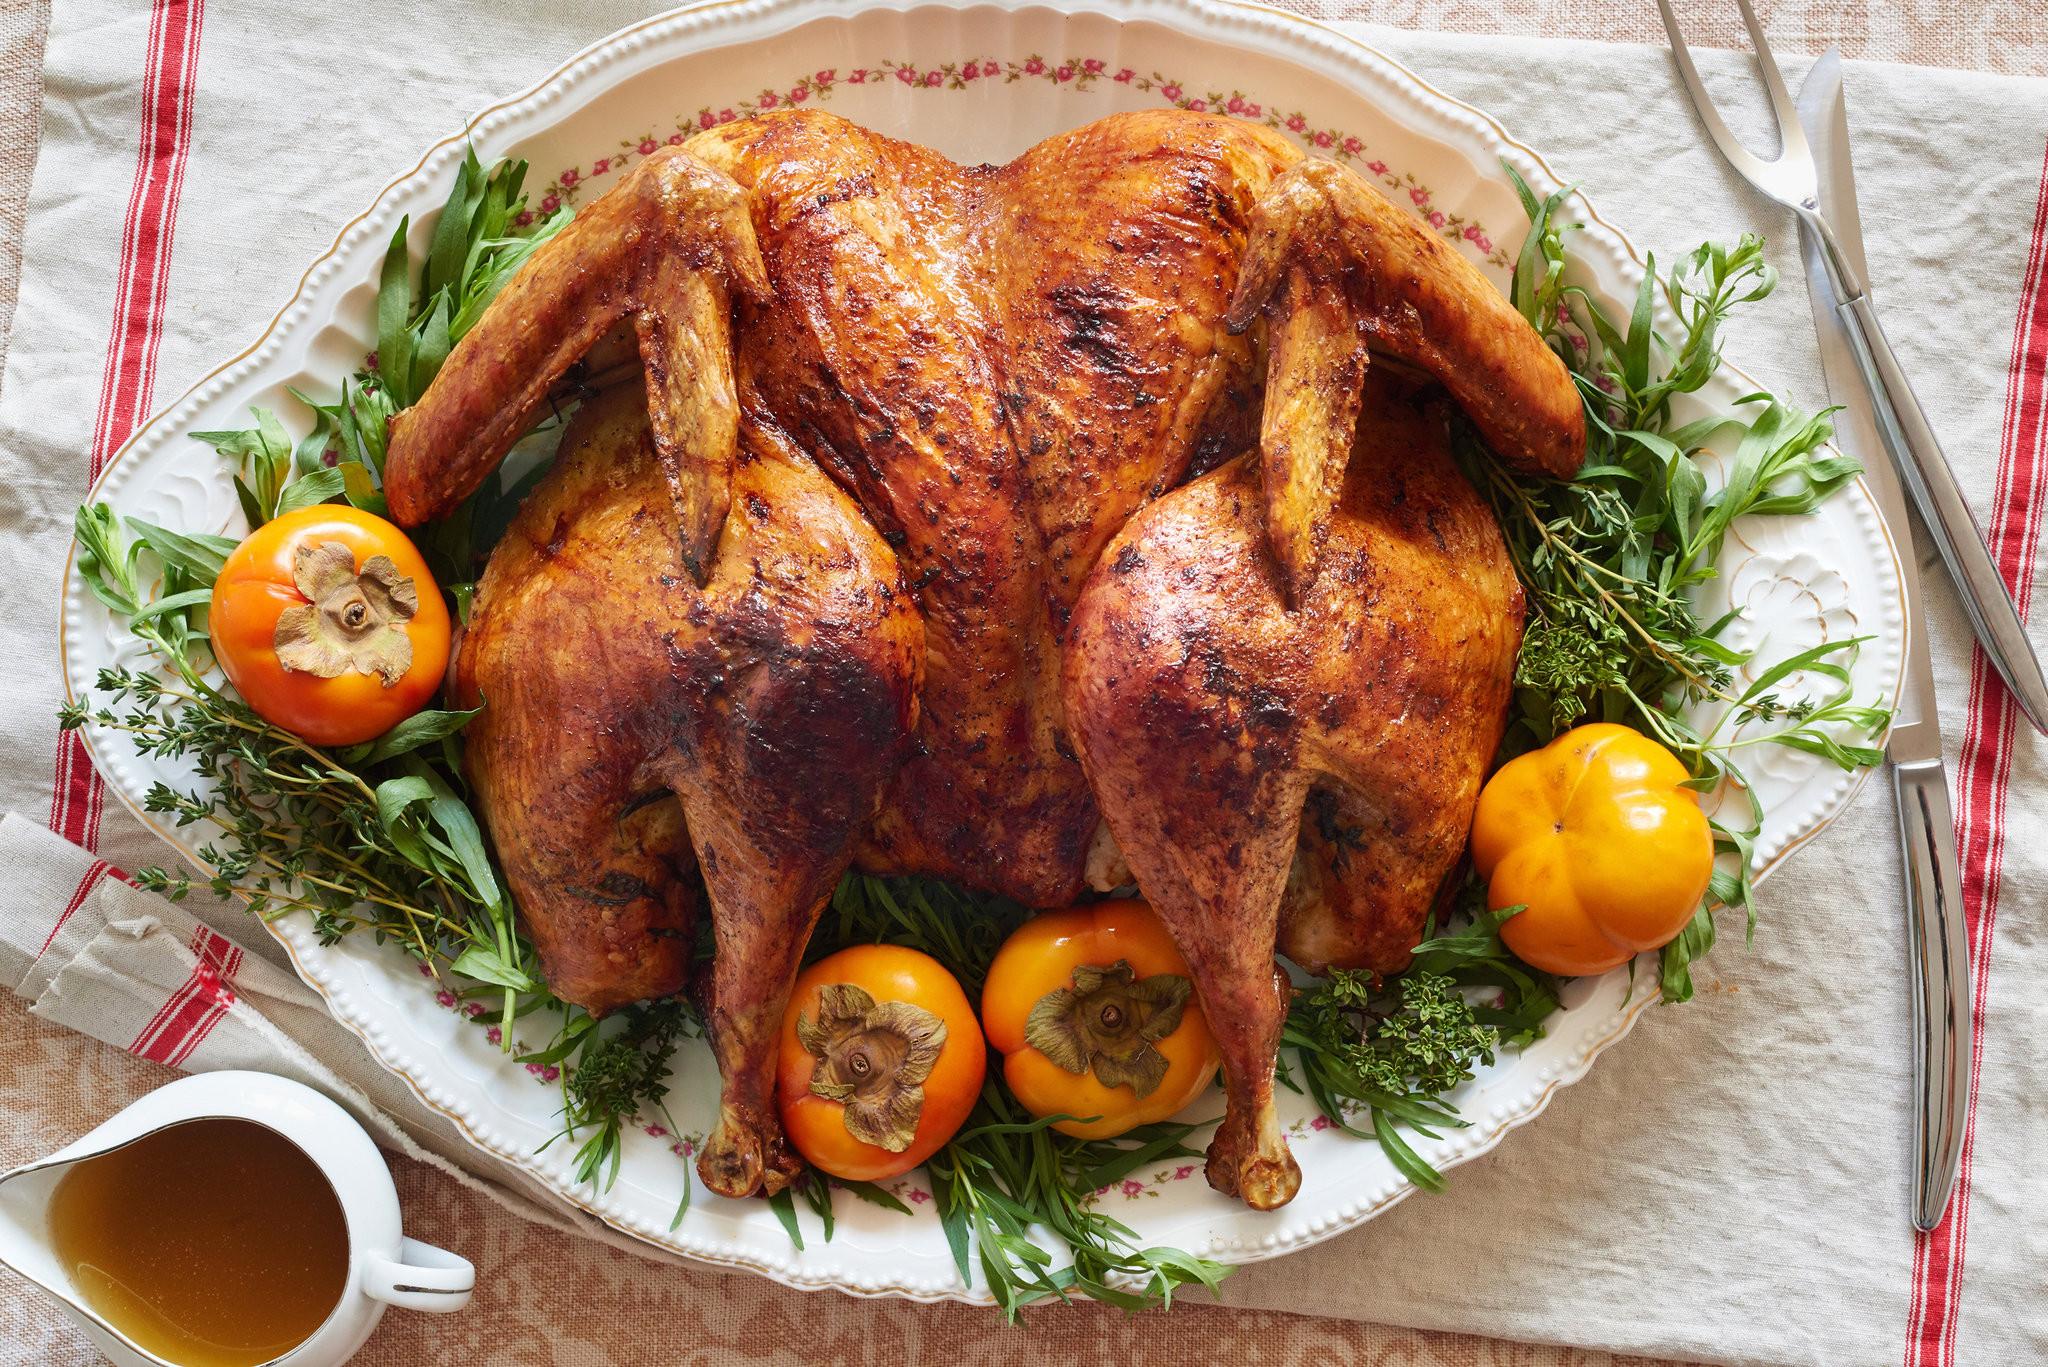 Cook Thanksgiving Turkey  45 Minute Roast Turkey Recipe NYT Cooking